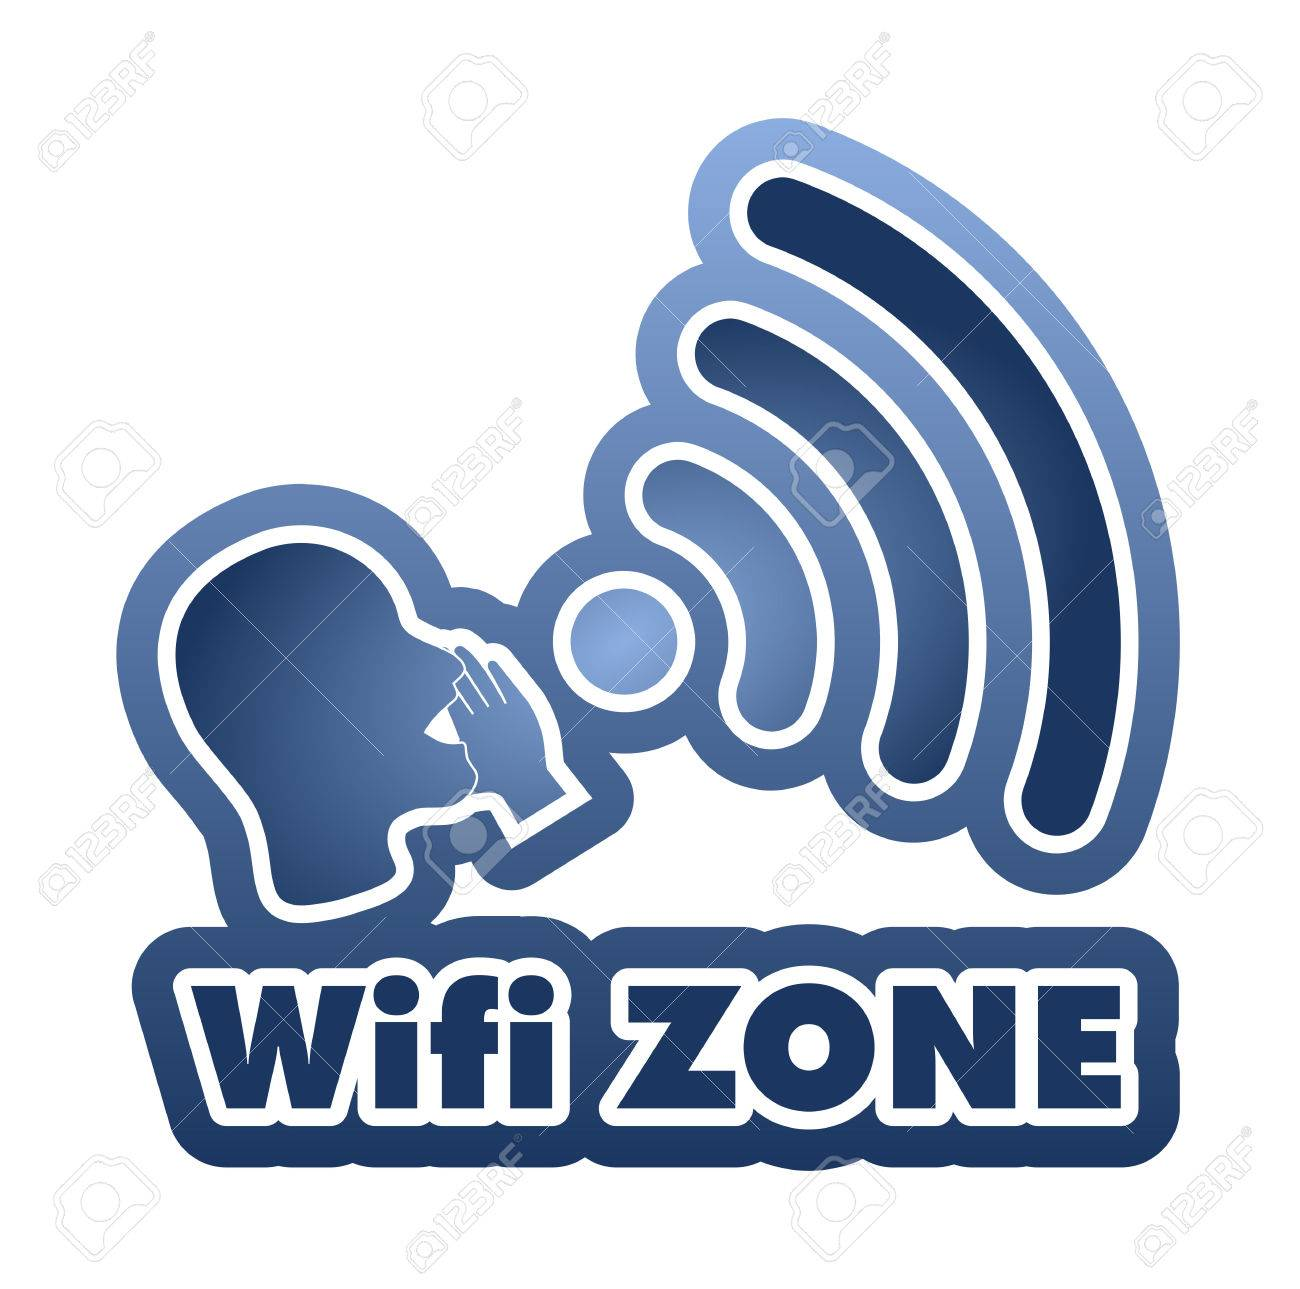 wifi zone vector illustration